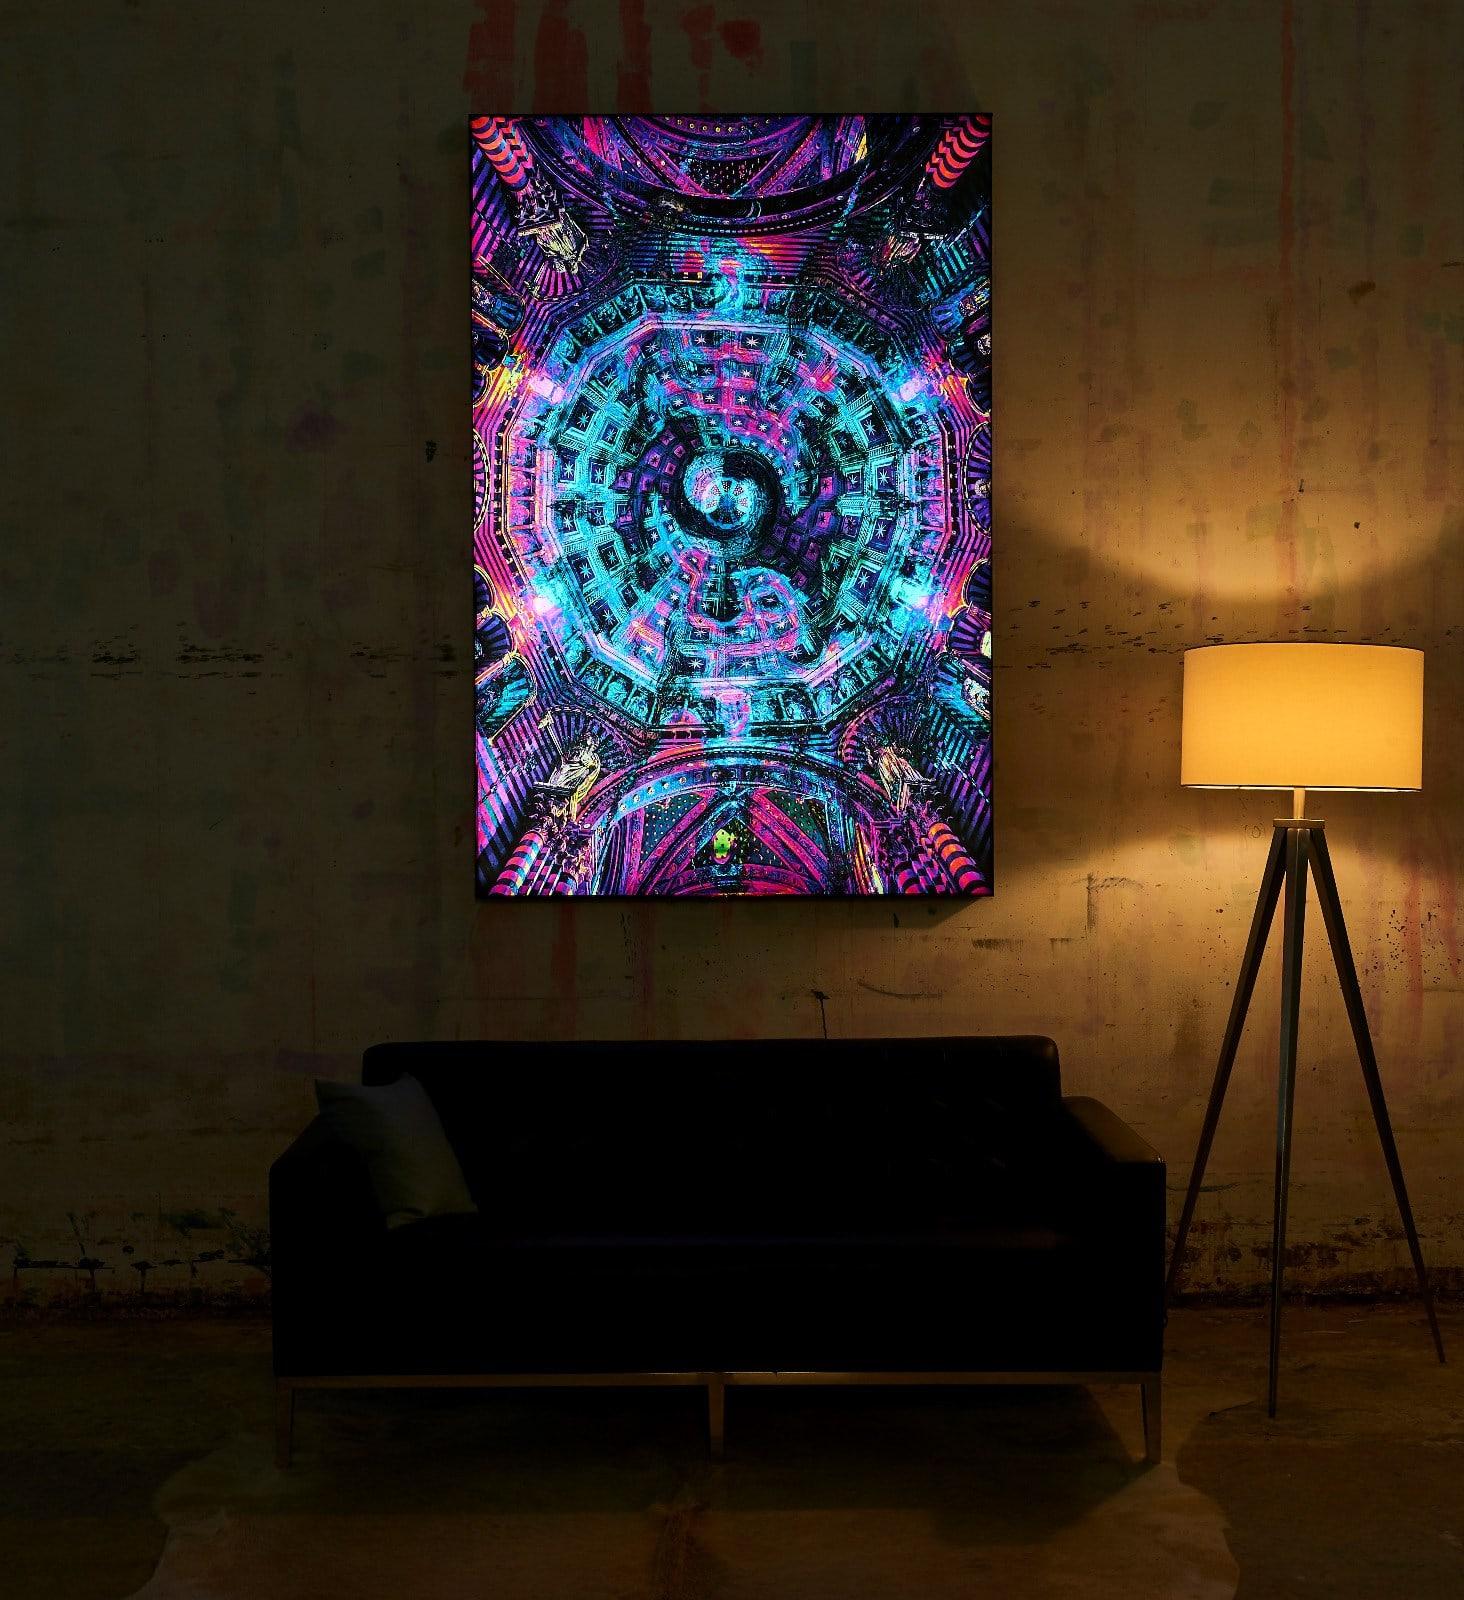 LED Backlit Frame, Poster, Photo - Big Naked Wall - Reviews ...